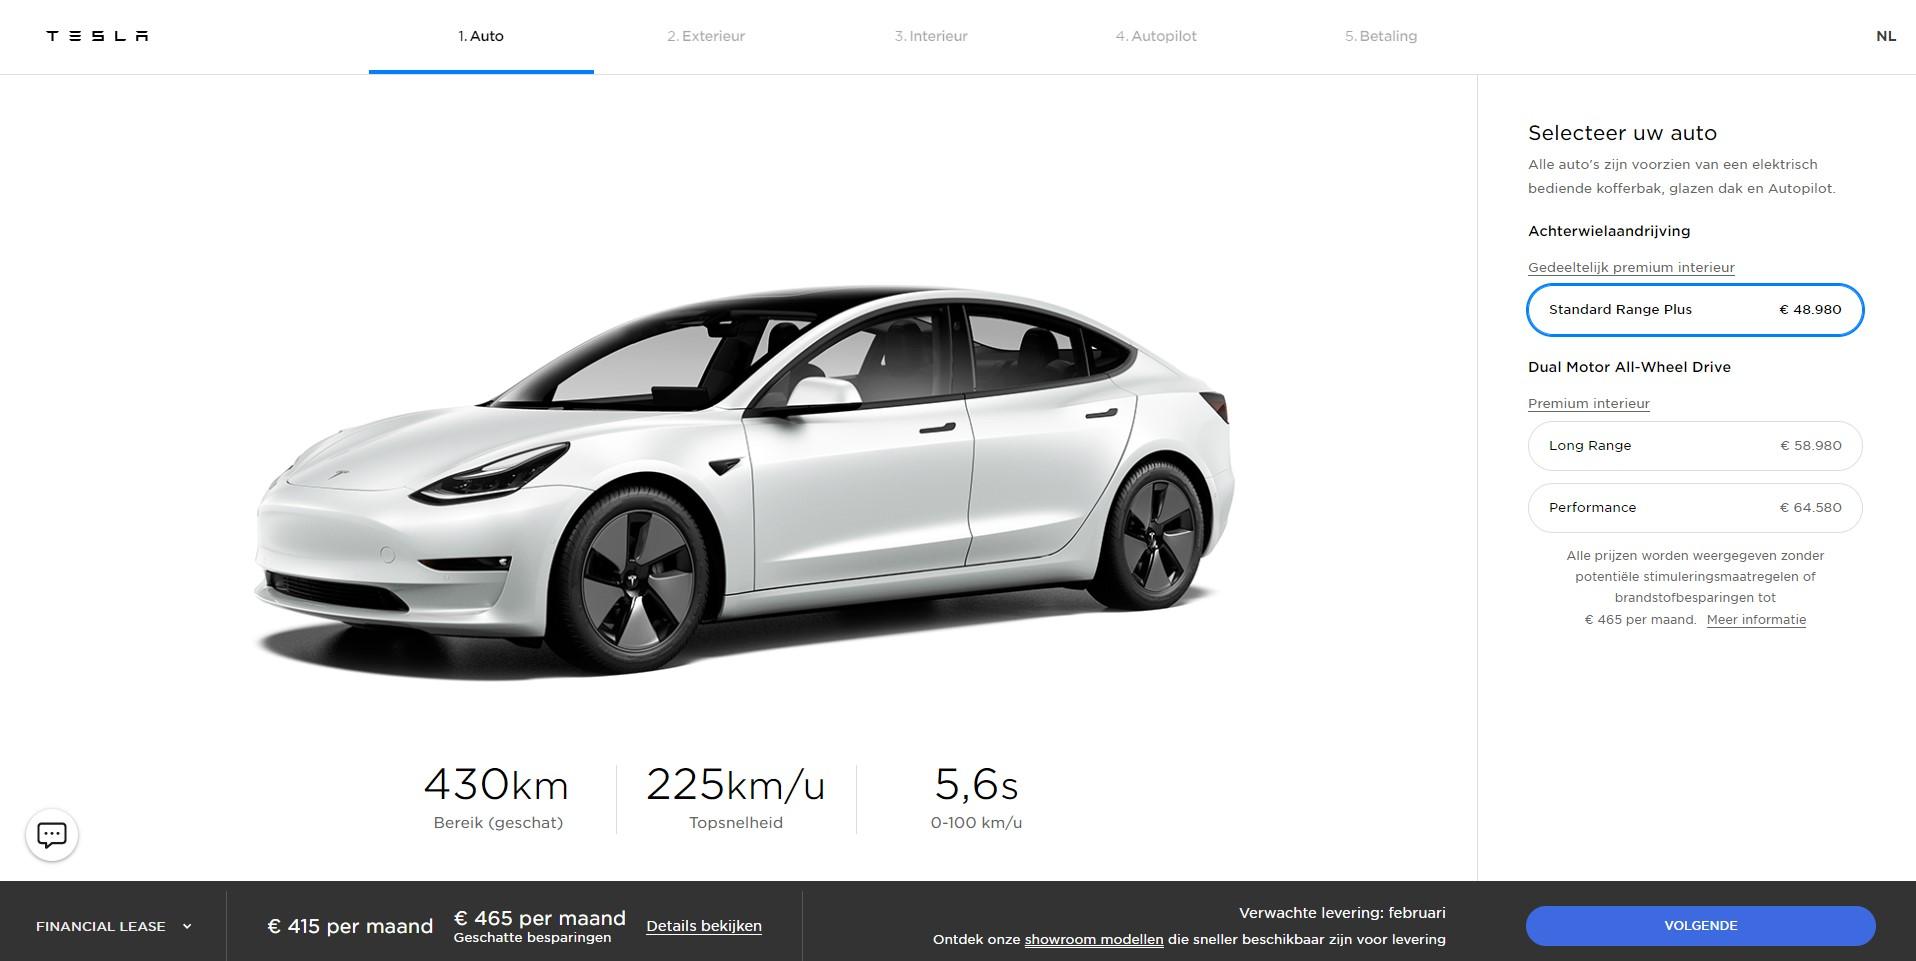 Tesla website via shopify